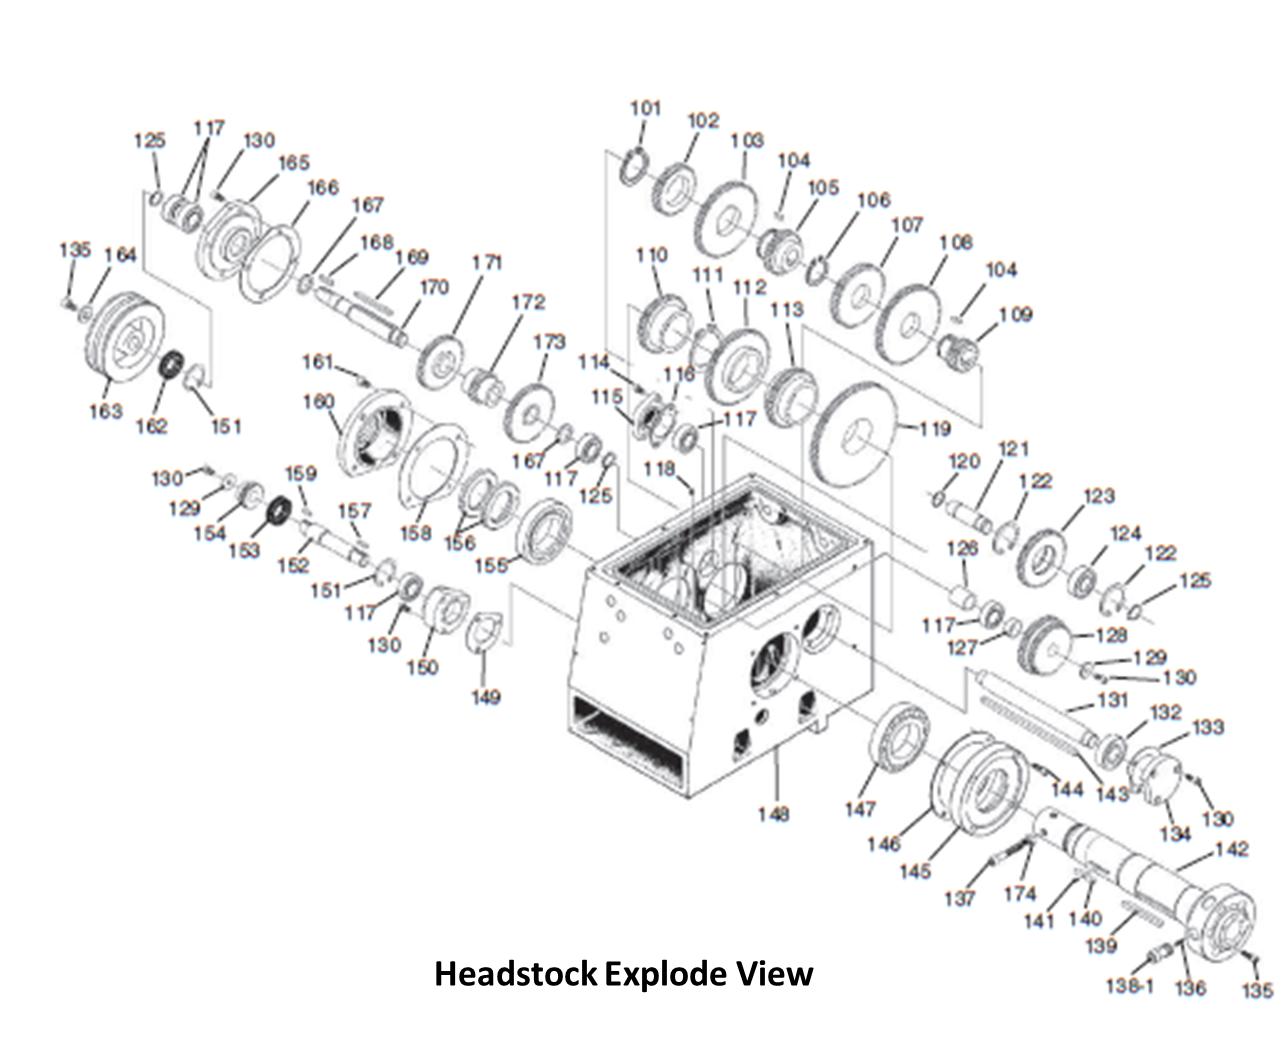 2012 10 01 archive on mb belt diagram